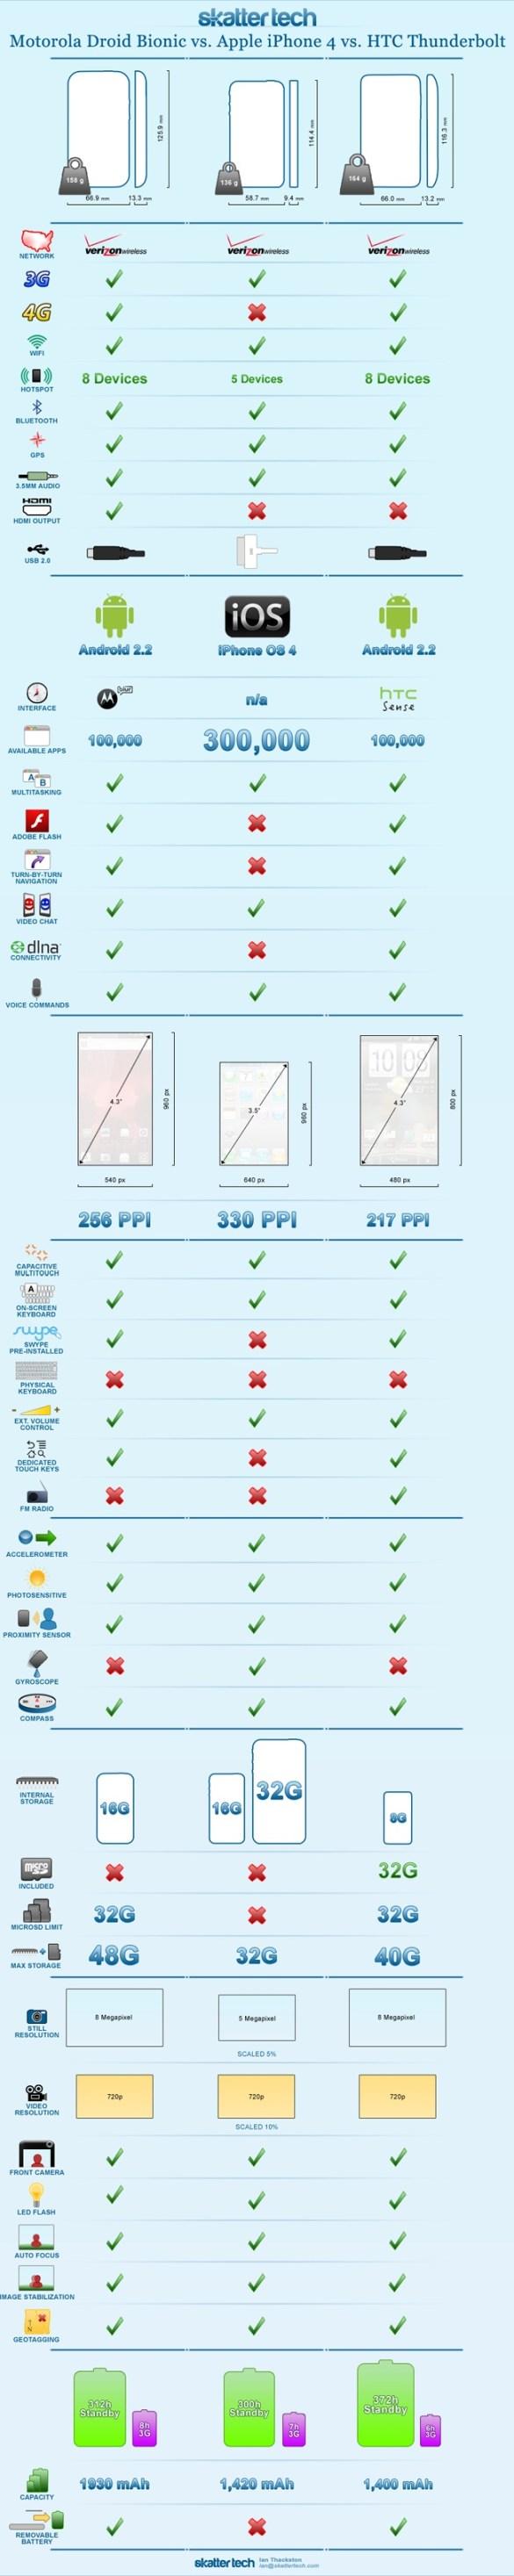 Motorola Droid Bionic vs. HTC Thunderbolt Vs. iPhone 4 Infographic